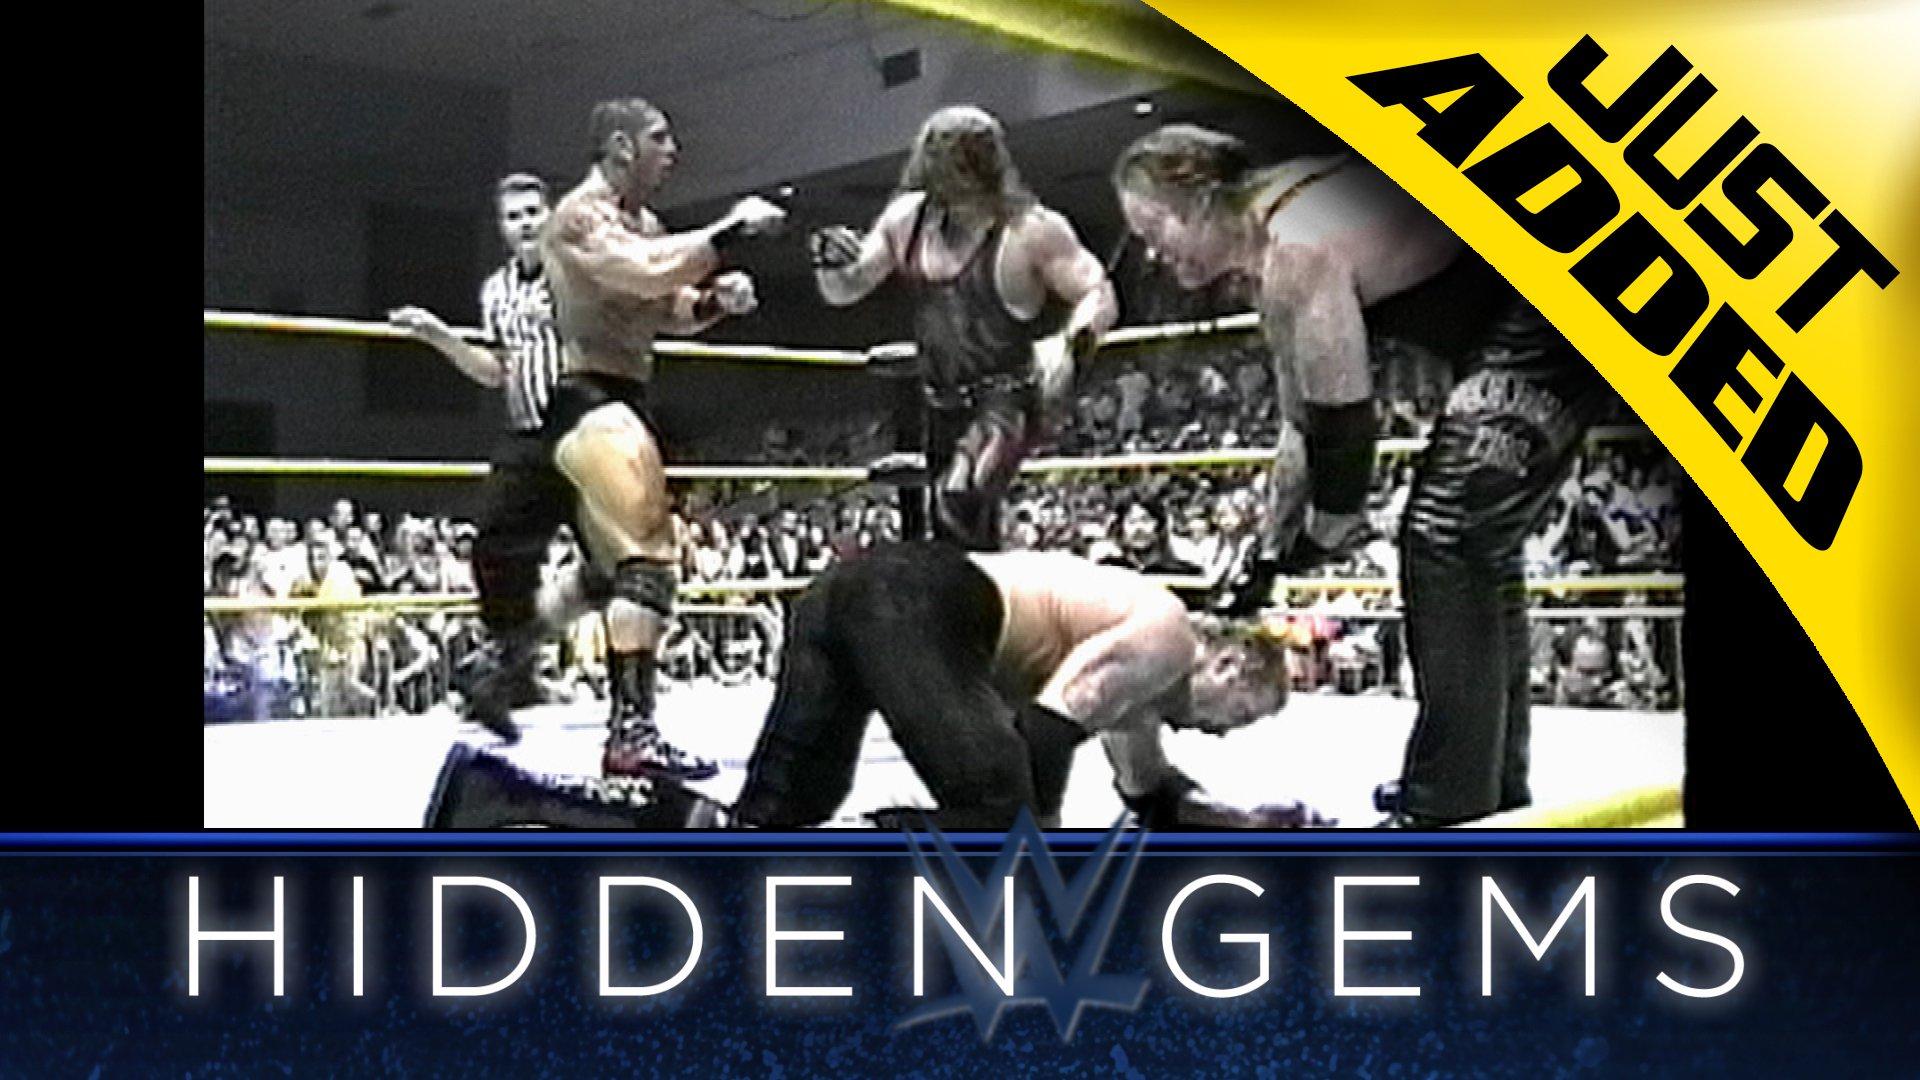 The Brothers of Destruction contre DDP & Batista (comme Leviathan) dans un rare WWE Hidden Gem (Exclusivité WWE Network)